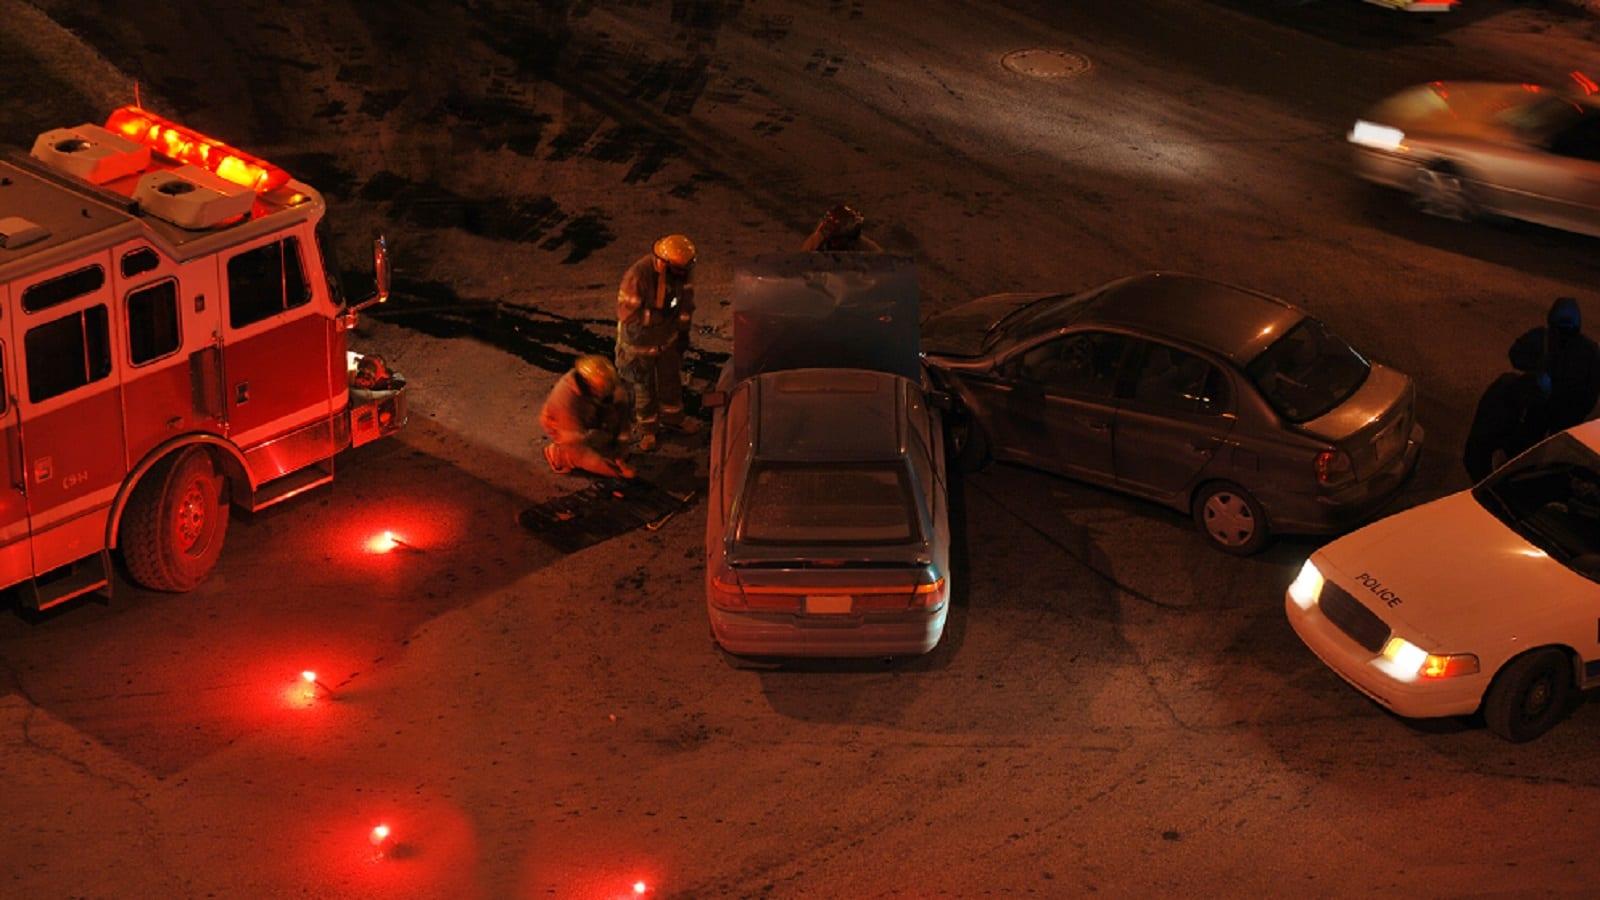 Car Accident Scene At Night Stock Photo